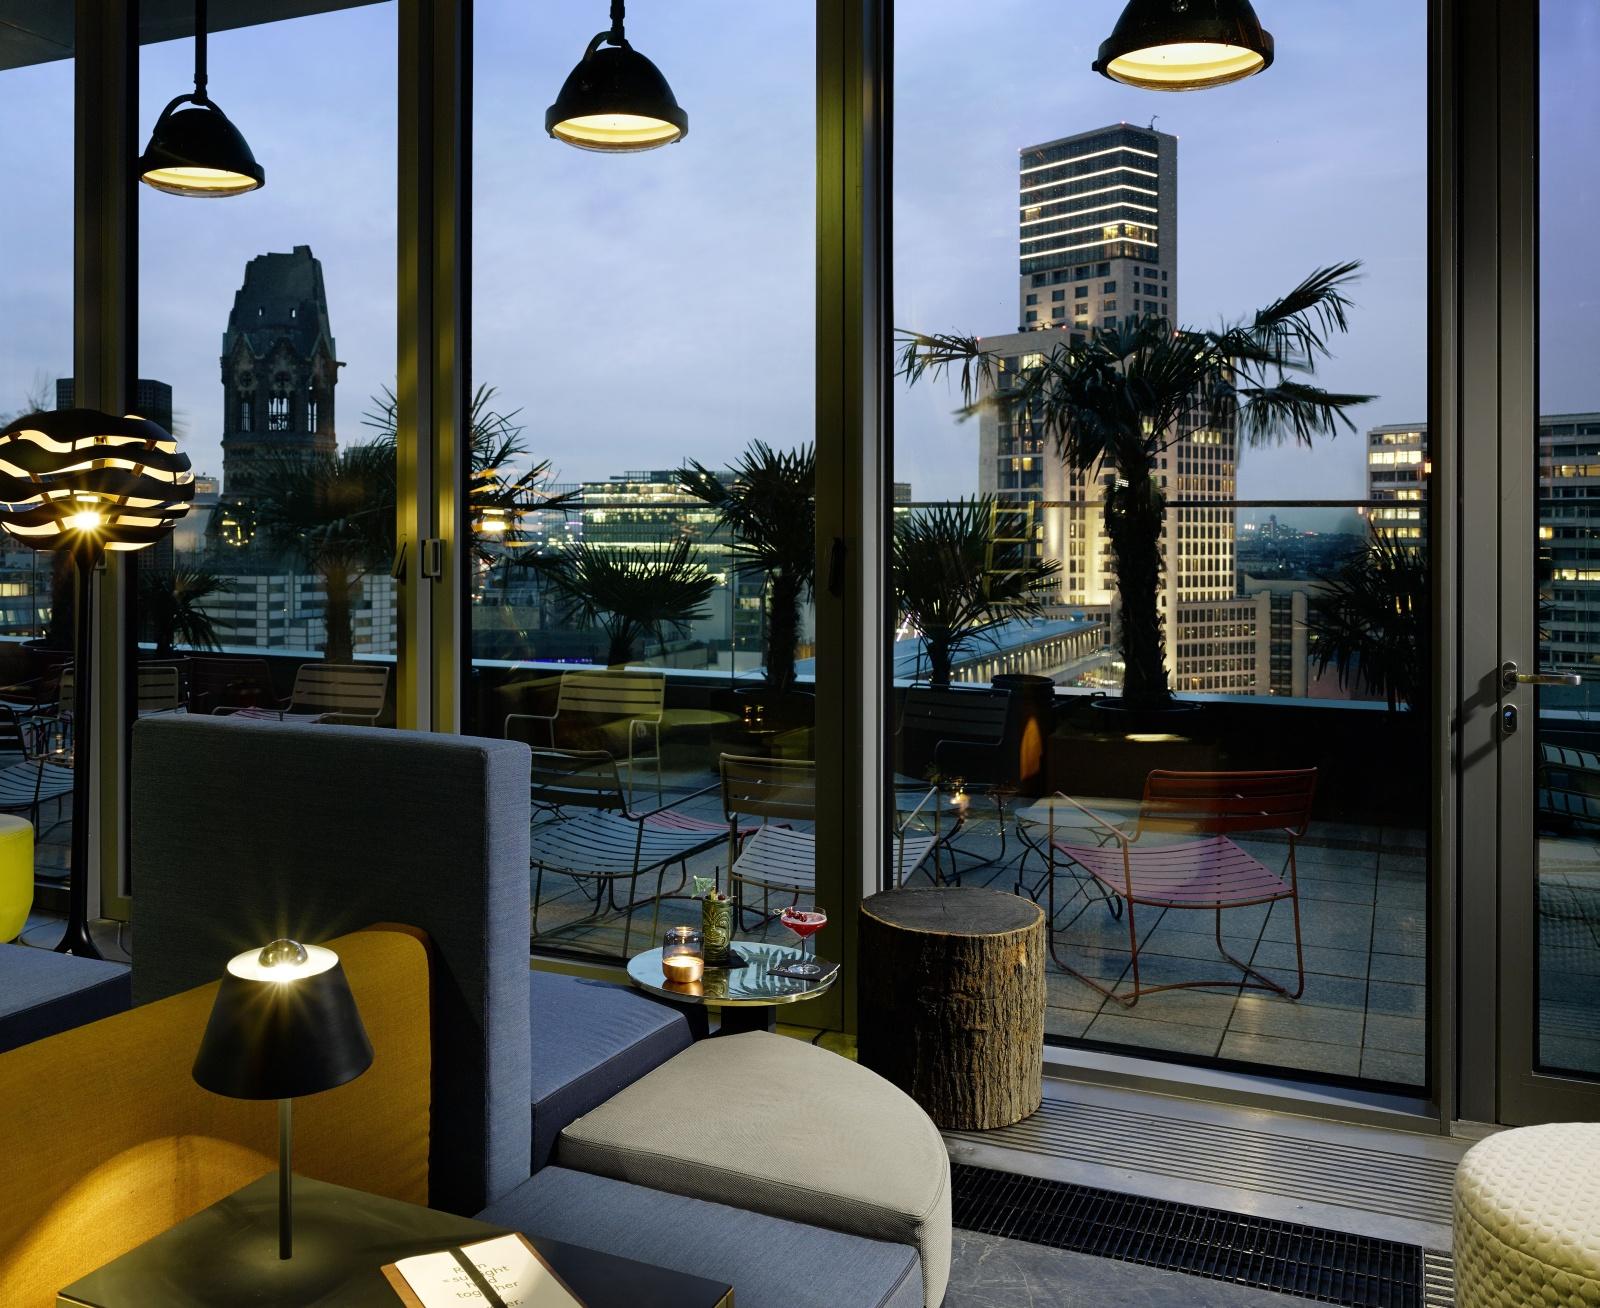 25hours bikini hotel berlin hipster paradise. Black Bedroom Furniture Sets. Home Design Ideas